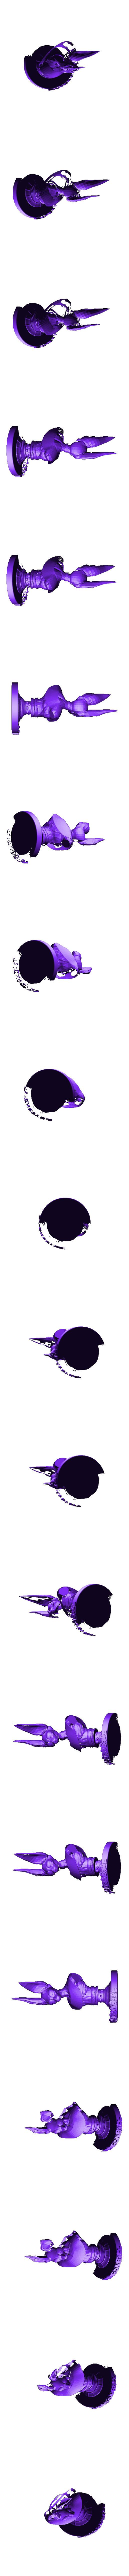 beerus.stl Download free STL file Beerus Bust Model • Design to 3D print, lmhoangptit